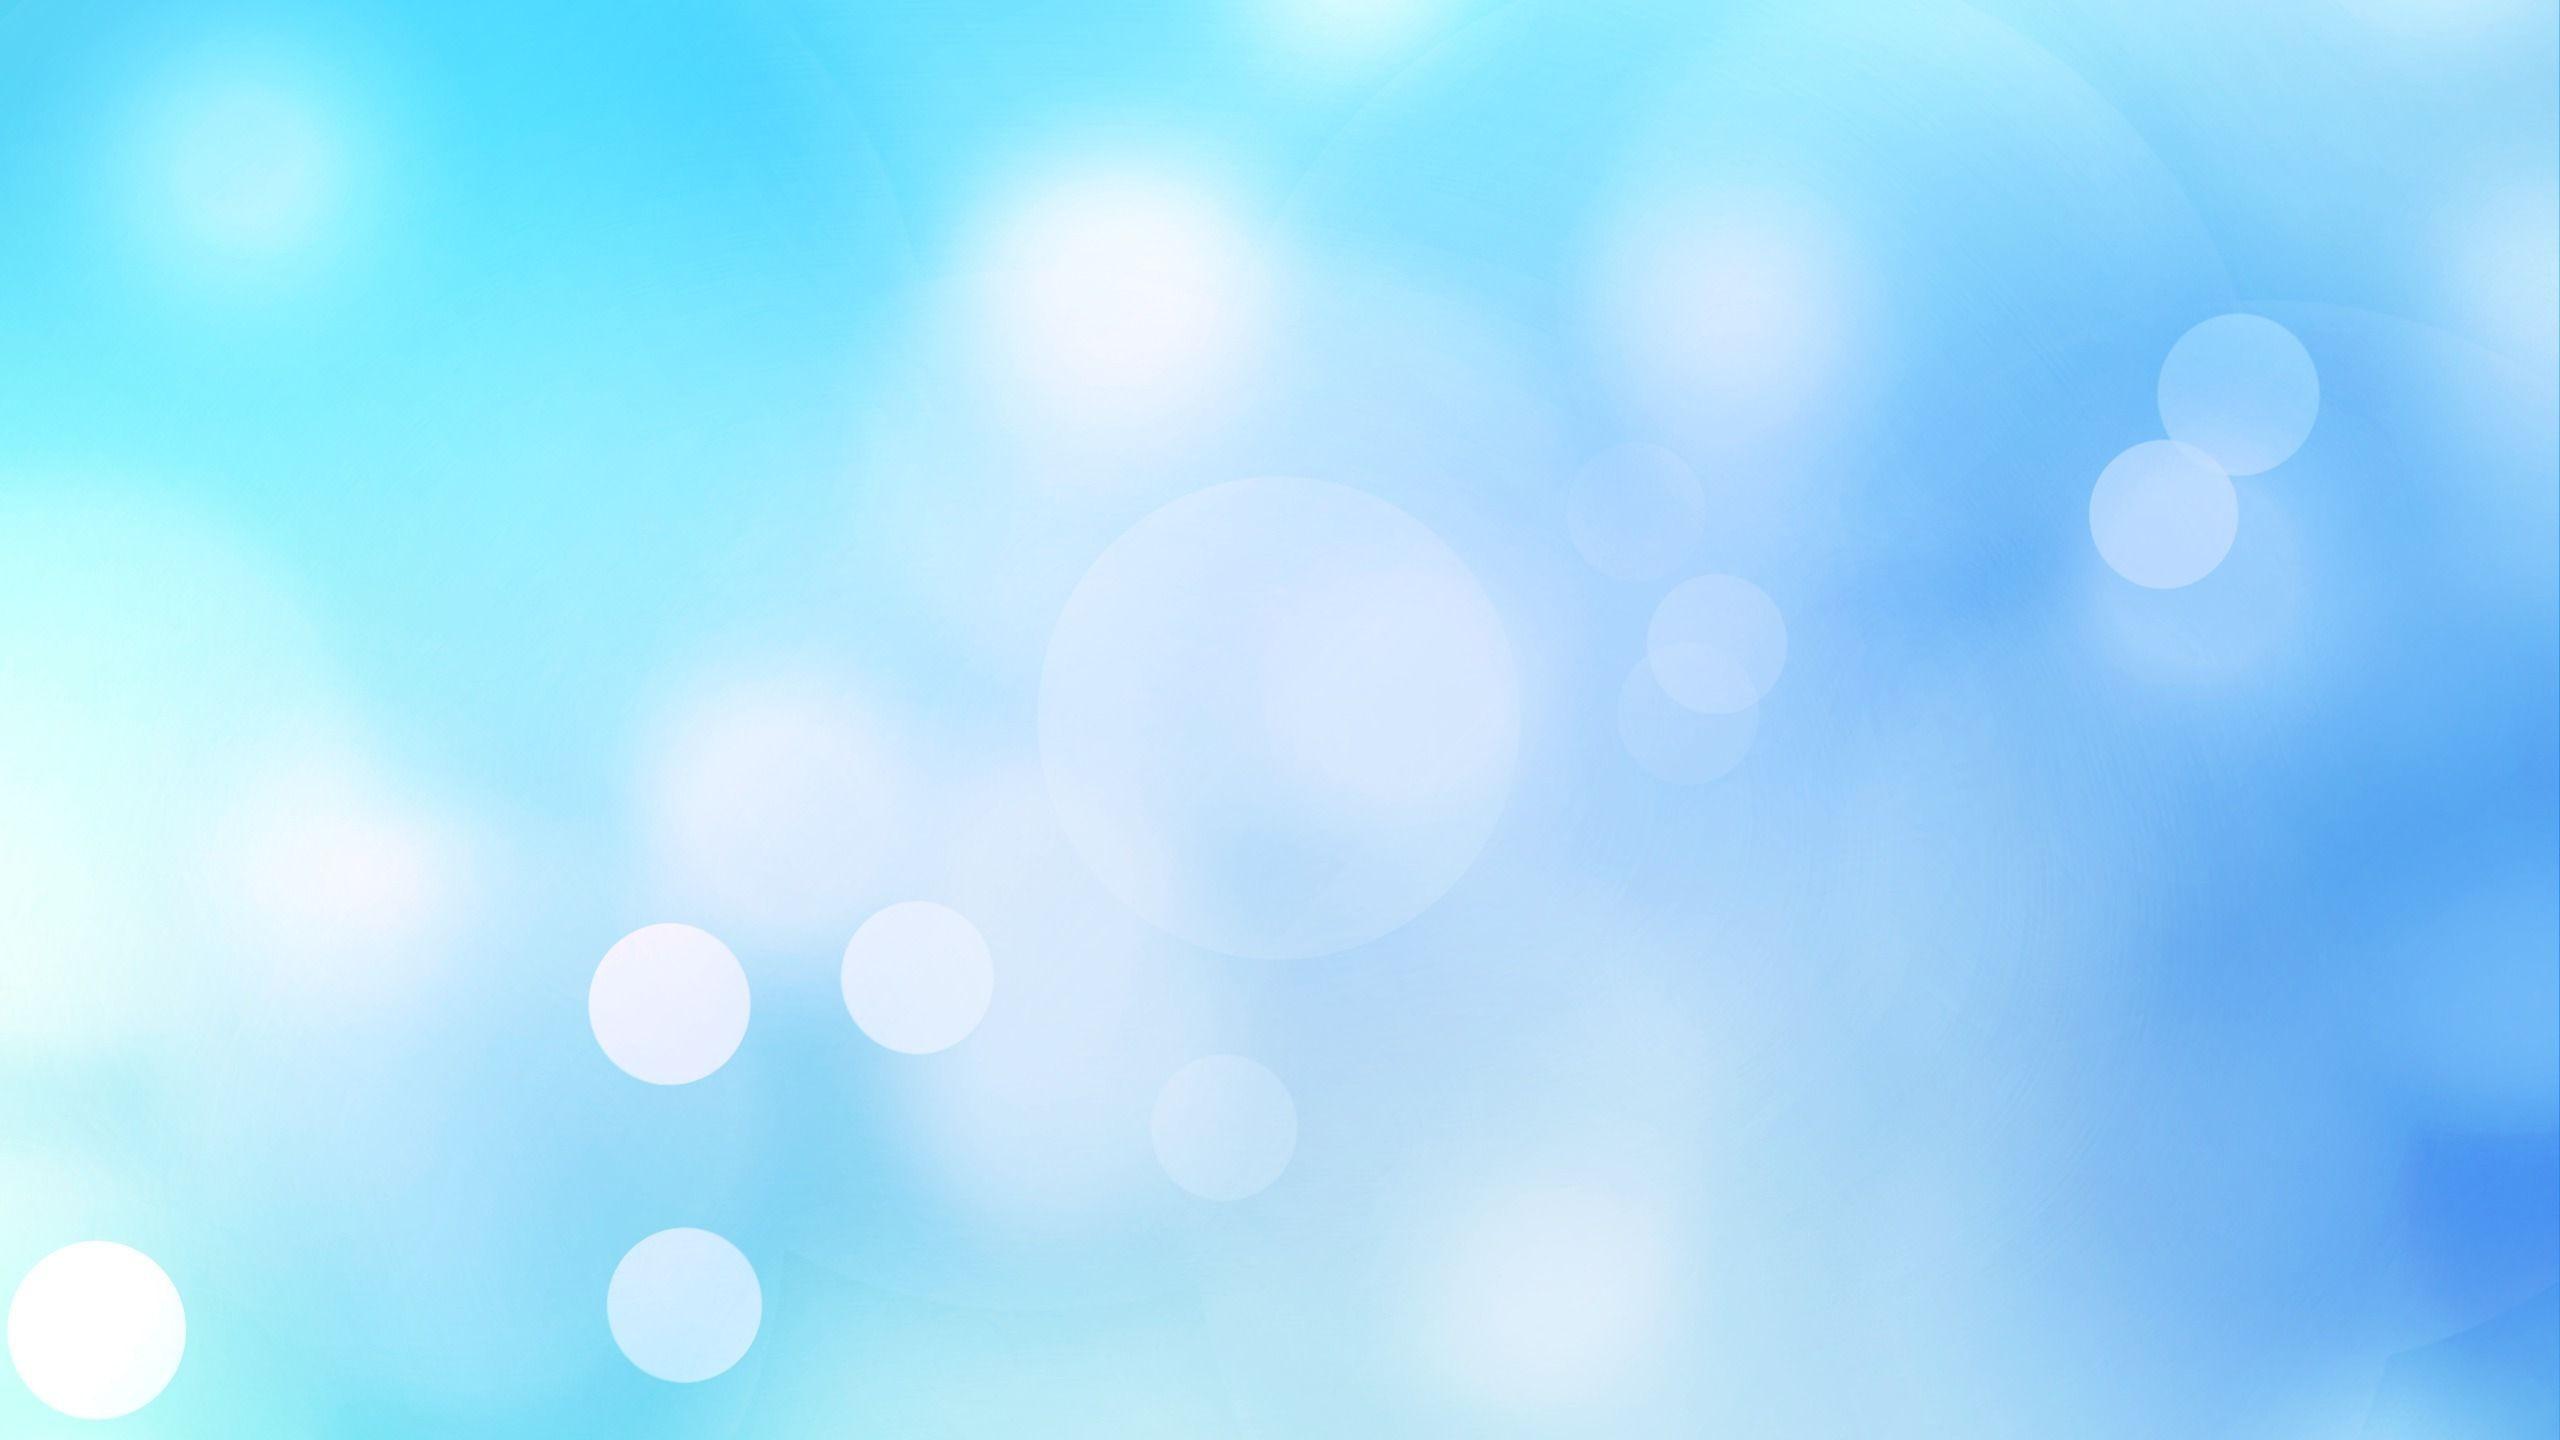 Blue Color Wallpaper for Computer – WallpaperSafari